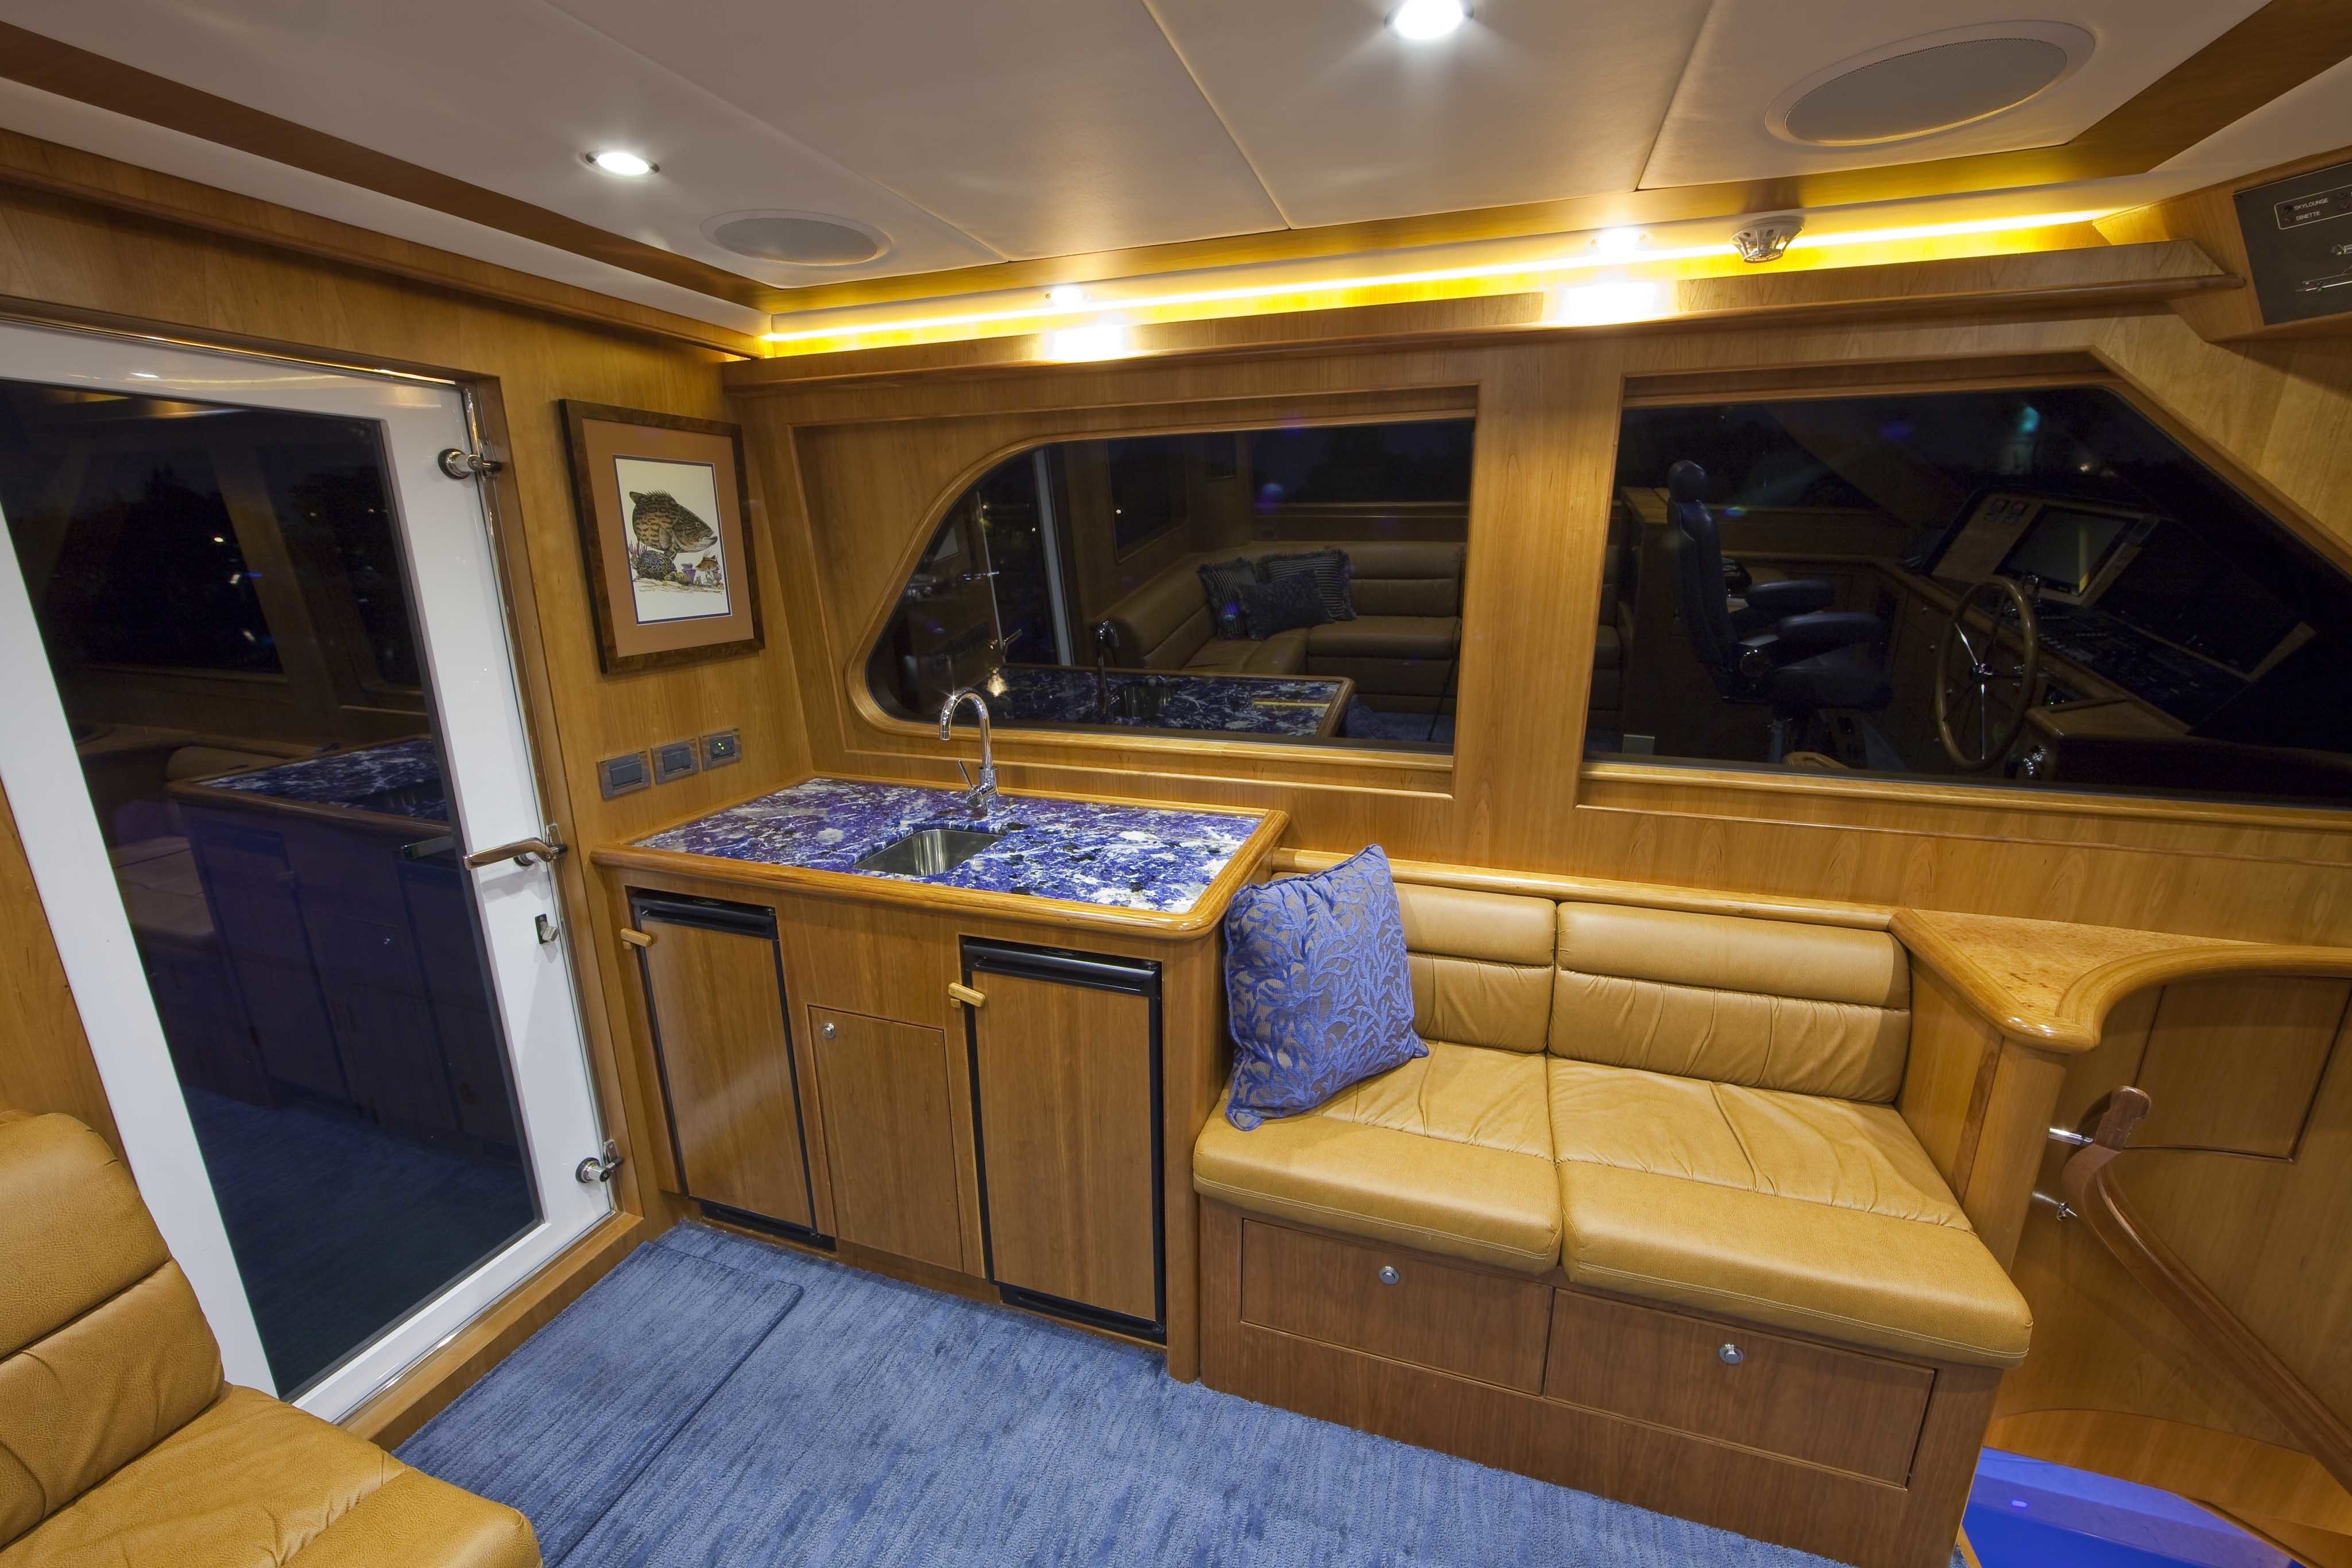 The 25m Yacht ANDIAMO